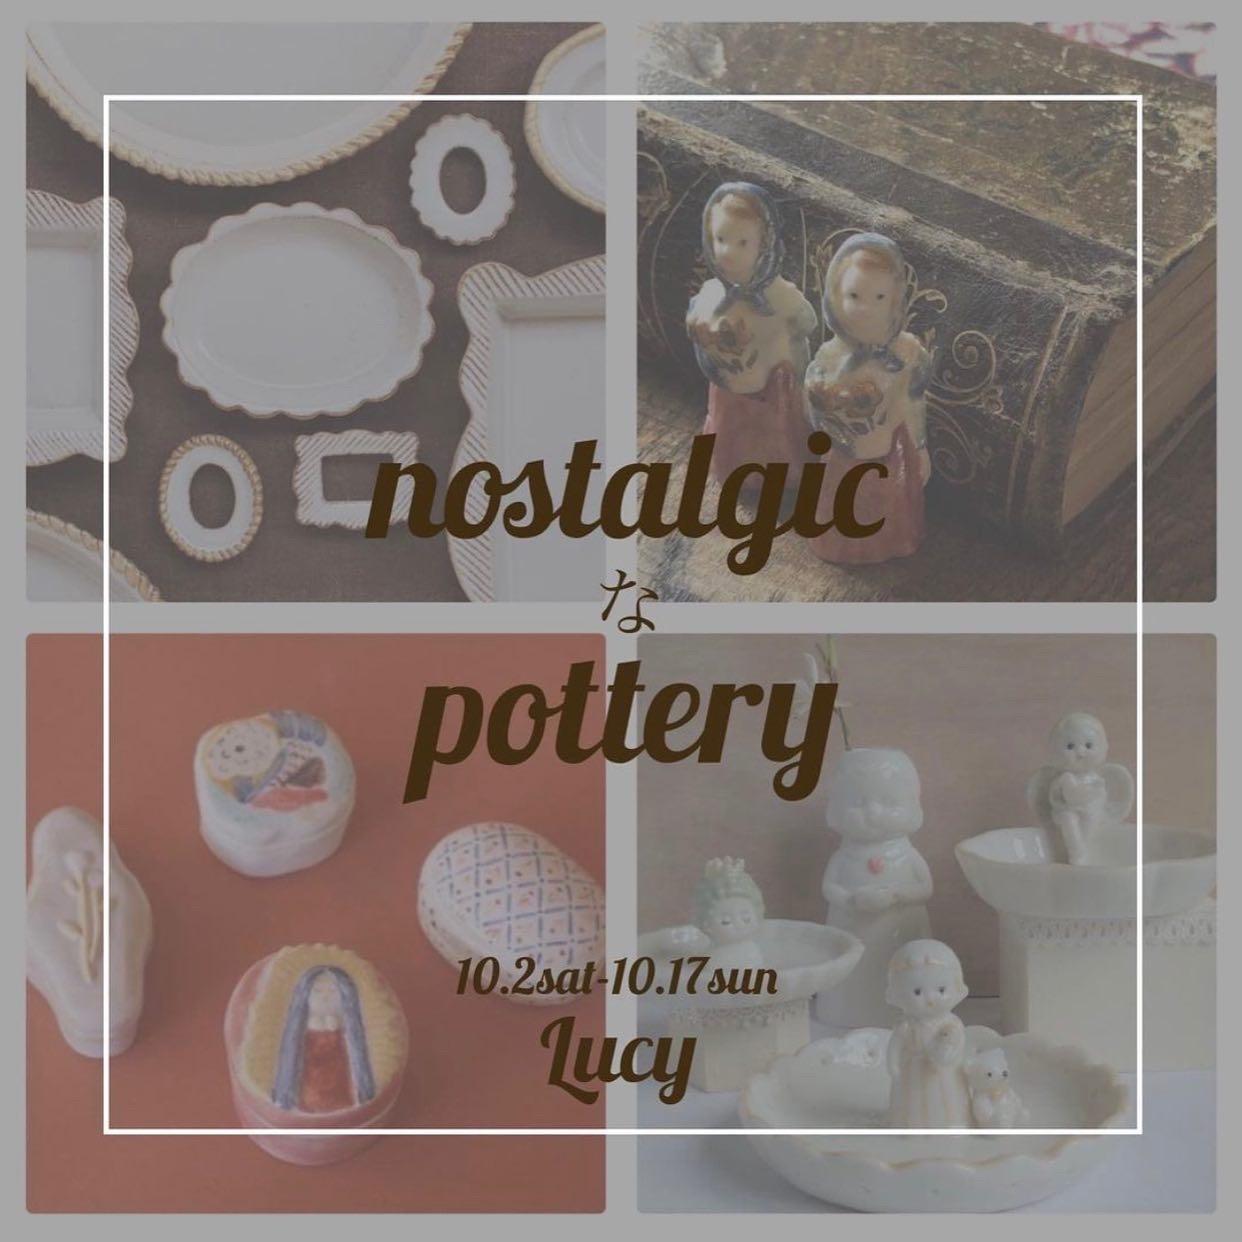 nostalgicなpottery@学芸大学Lucy-secretcloset-出品作品_a0137727_16531925.jpeg